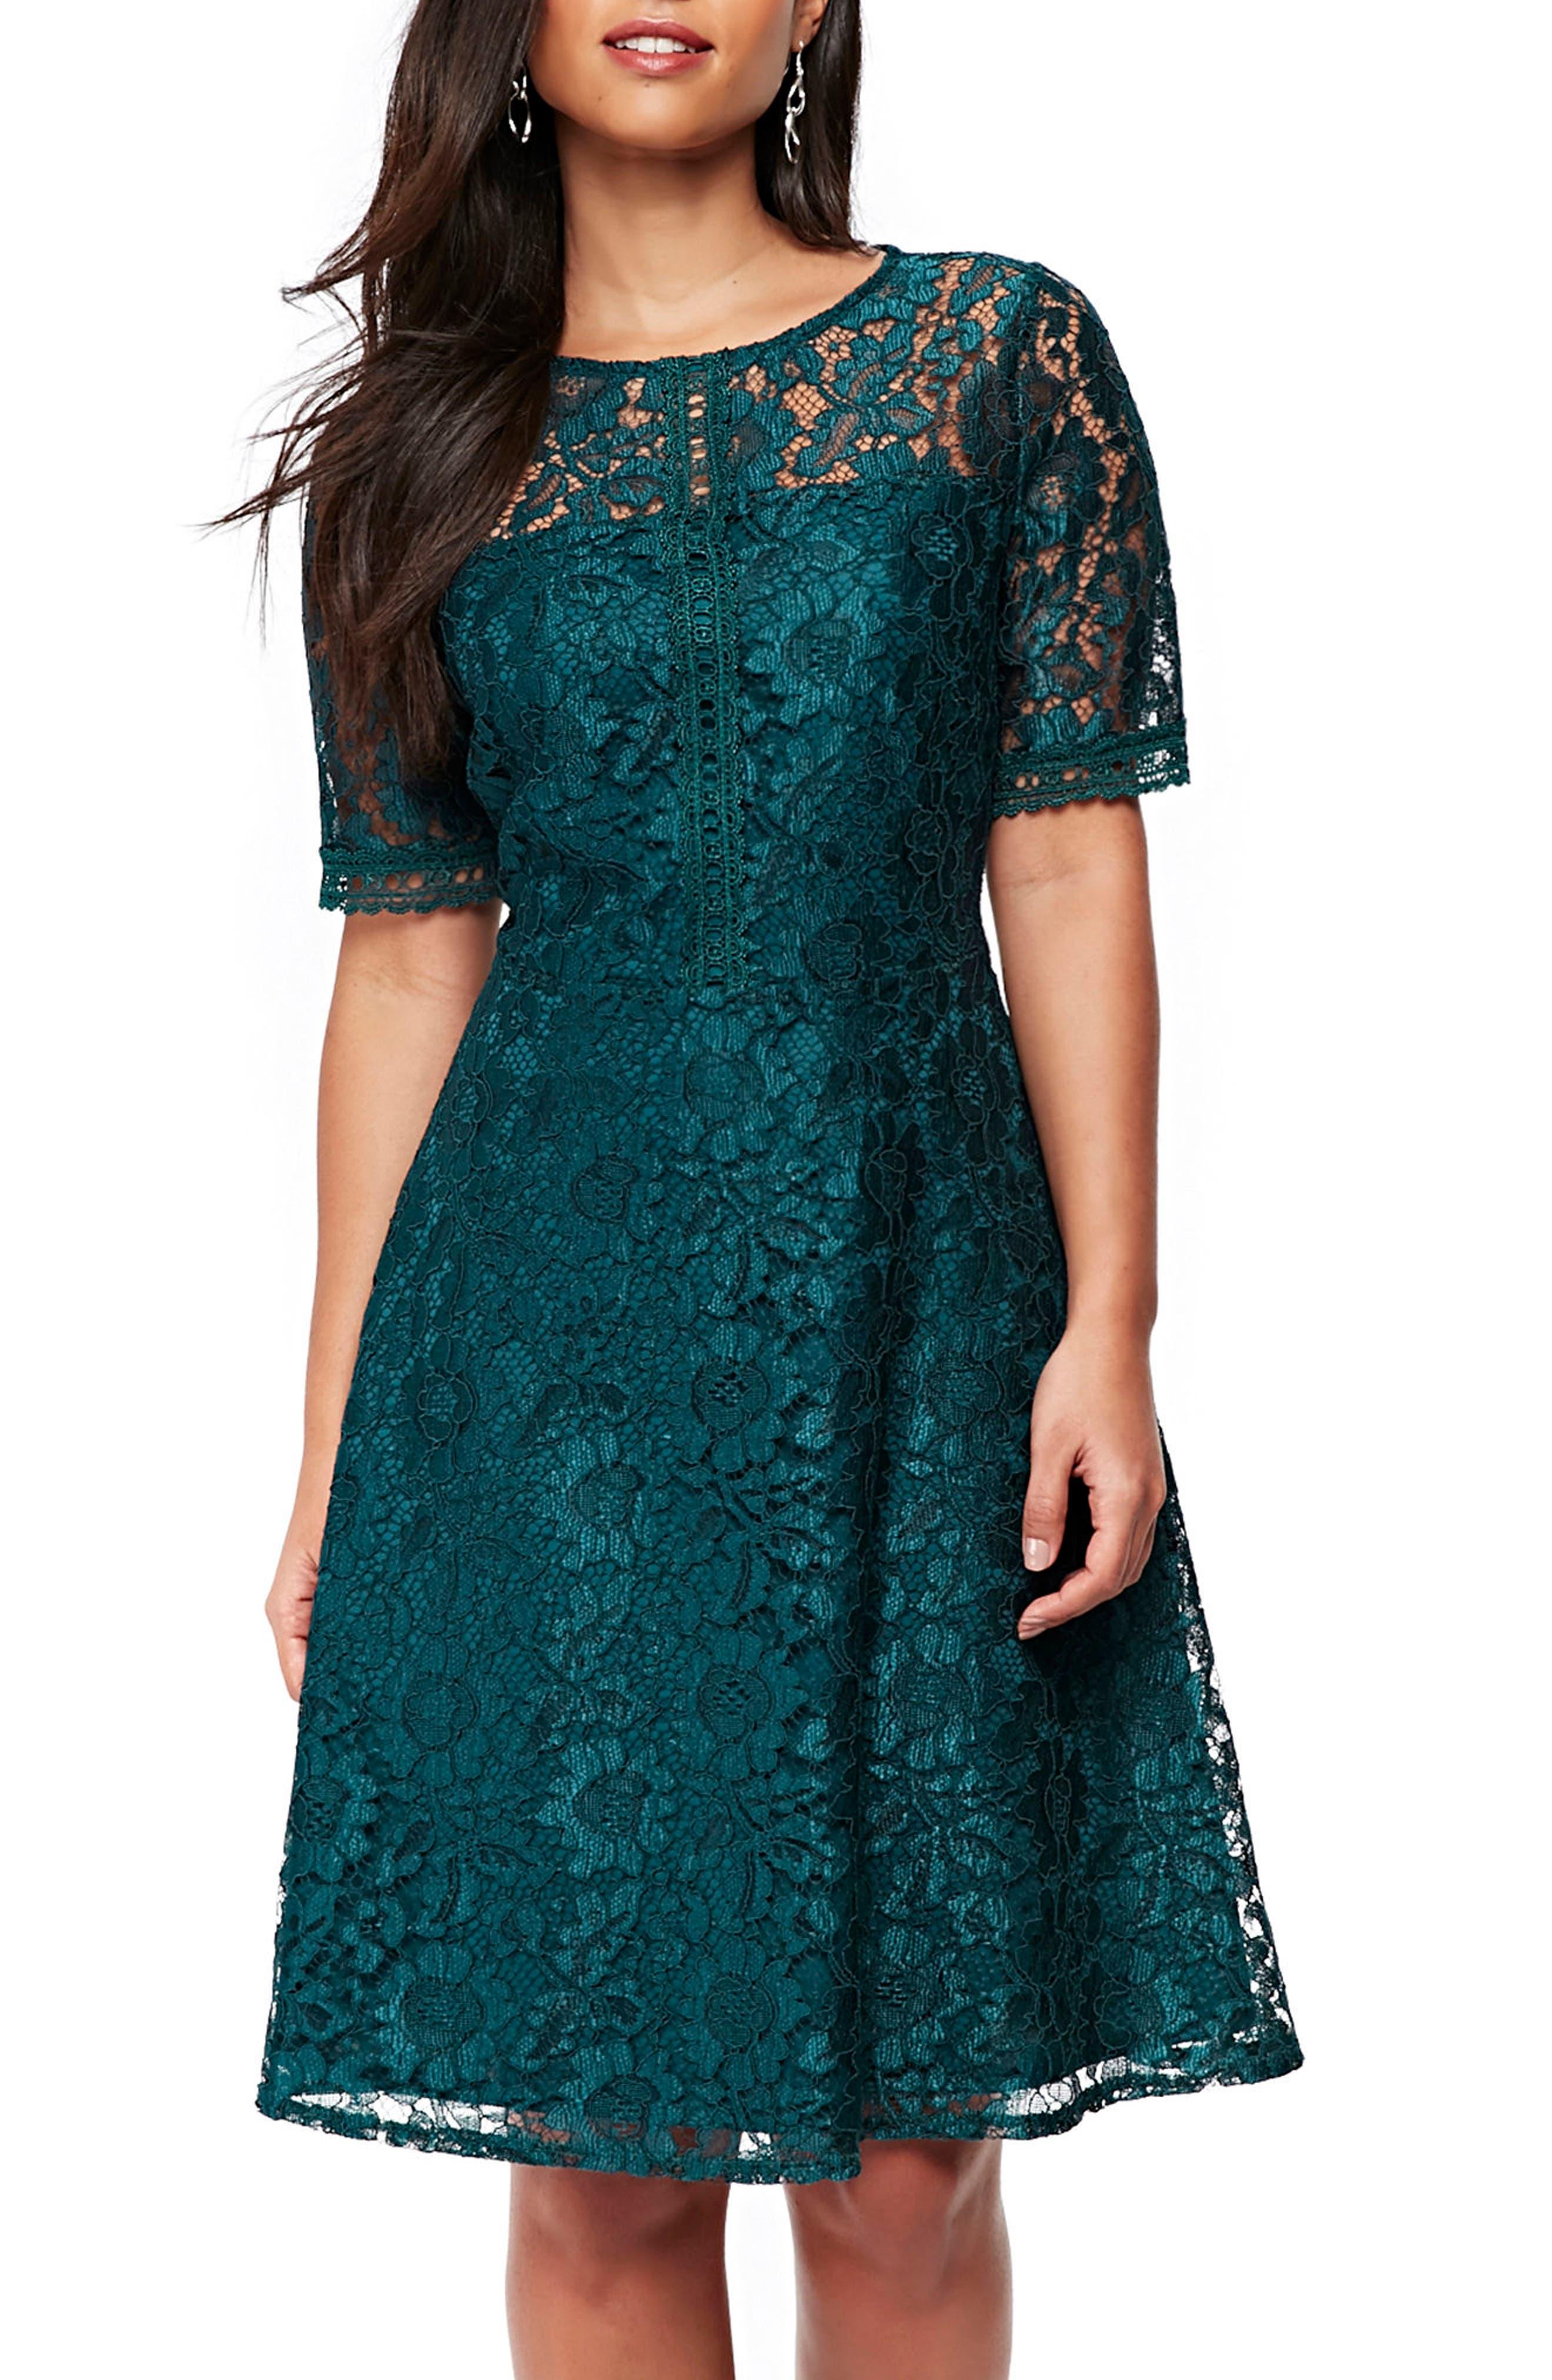 Lace & Lattice Fit & Flare Dress,                             Main thumbnail 1, color,                             Teal